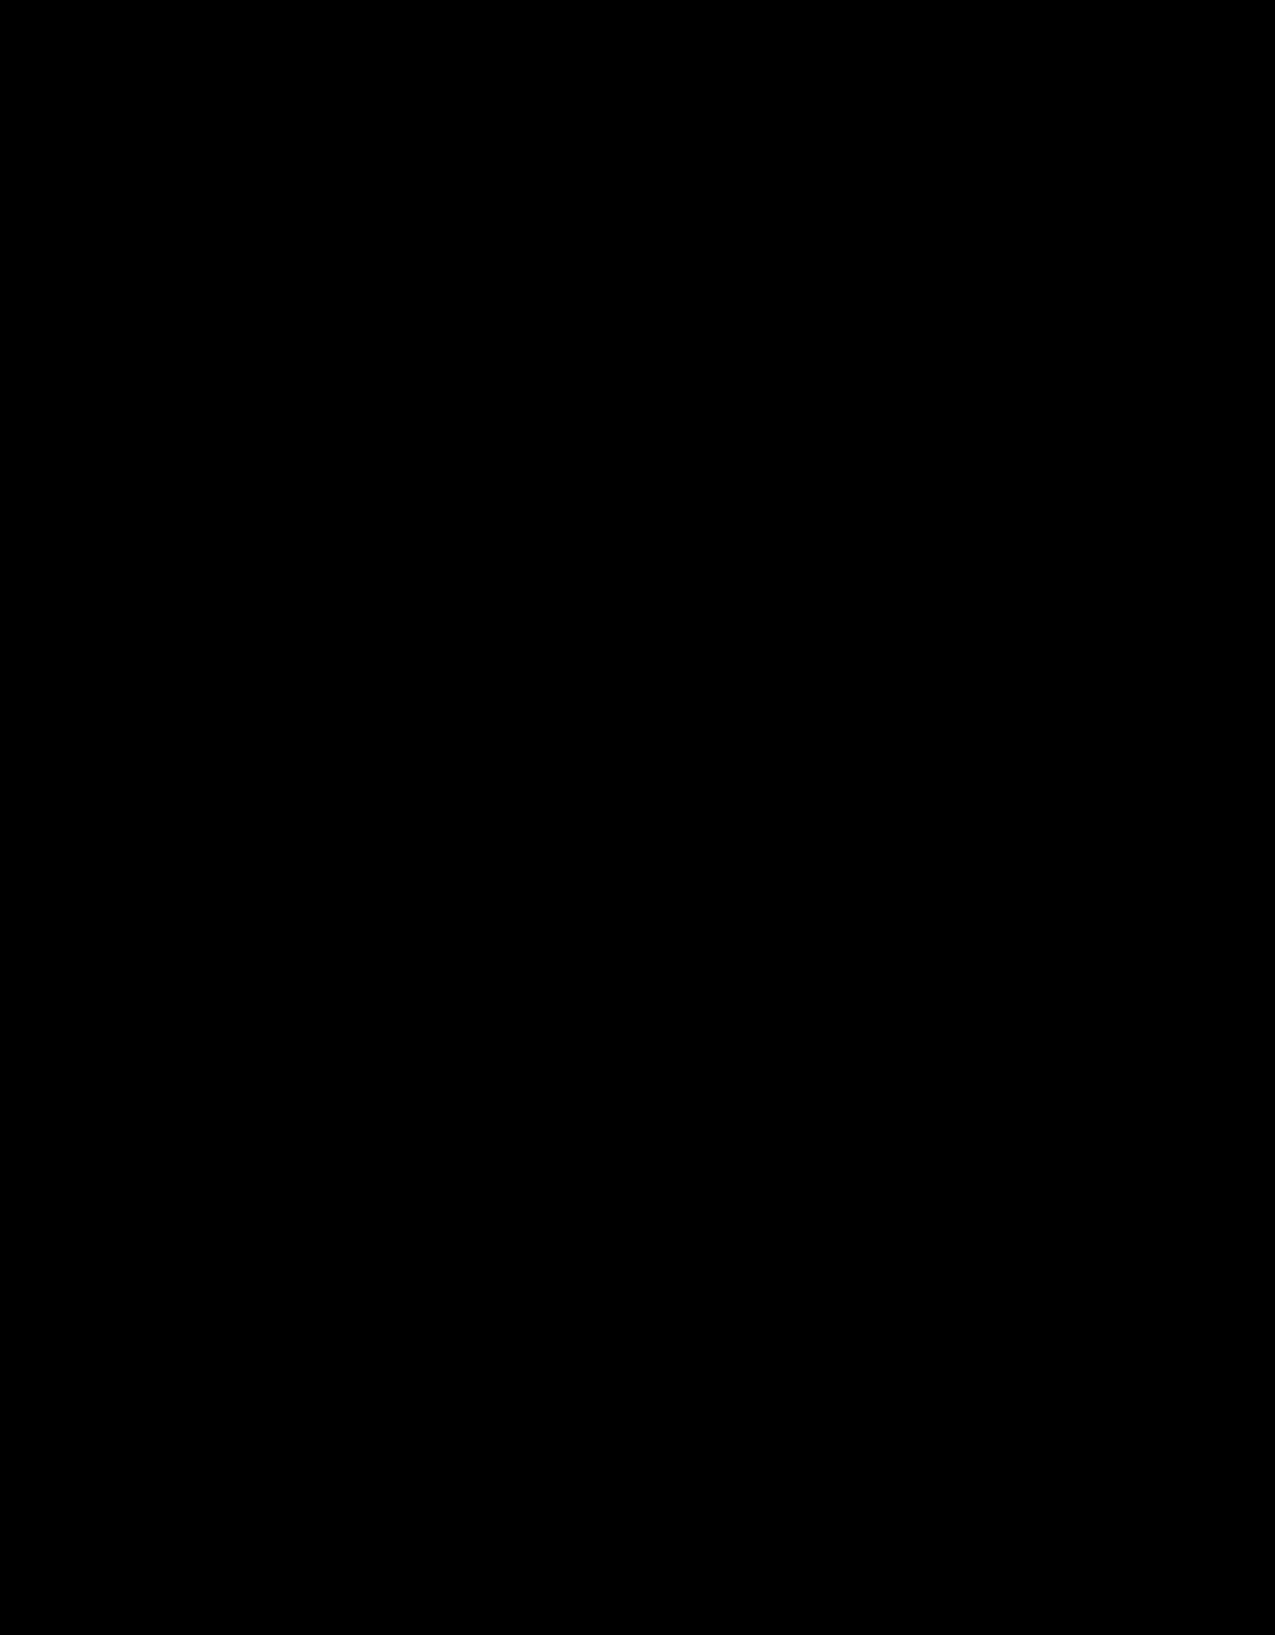 Logo MailChimp formation de base